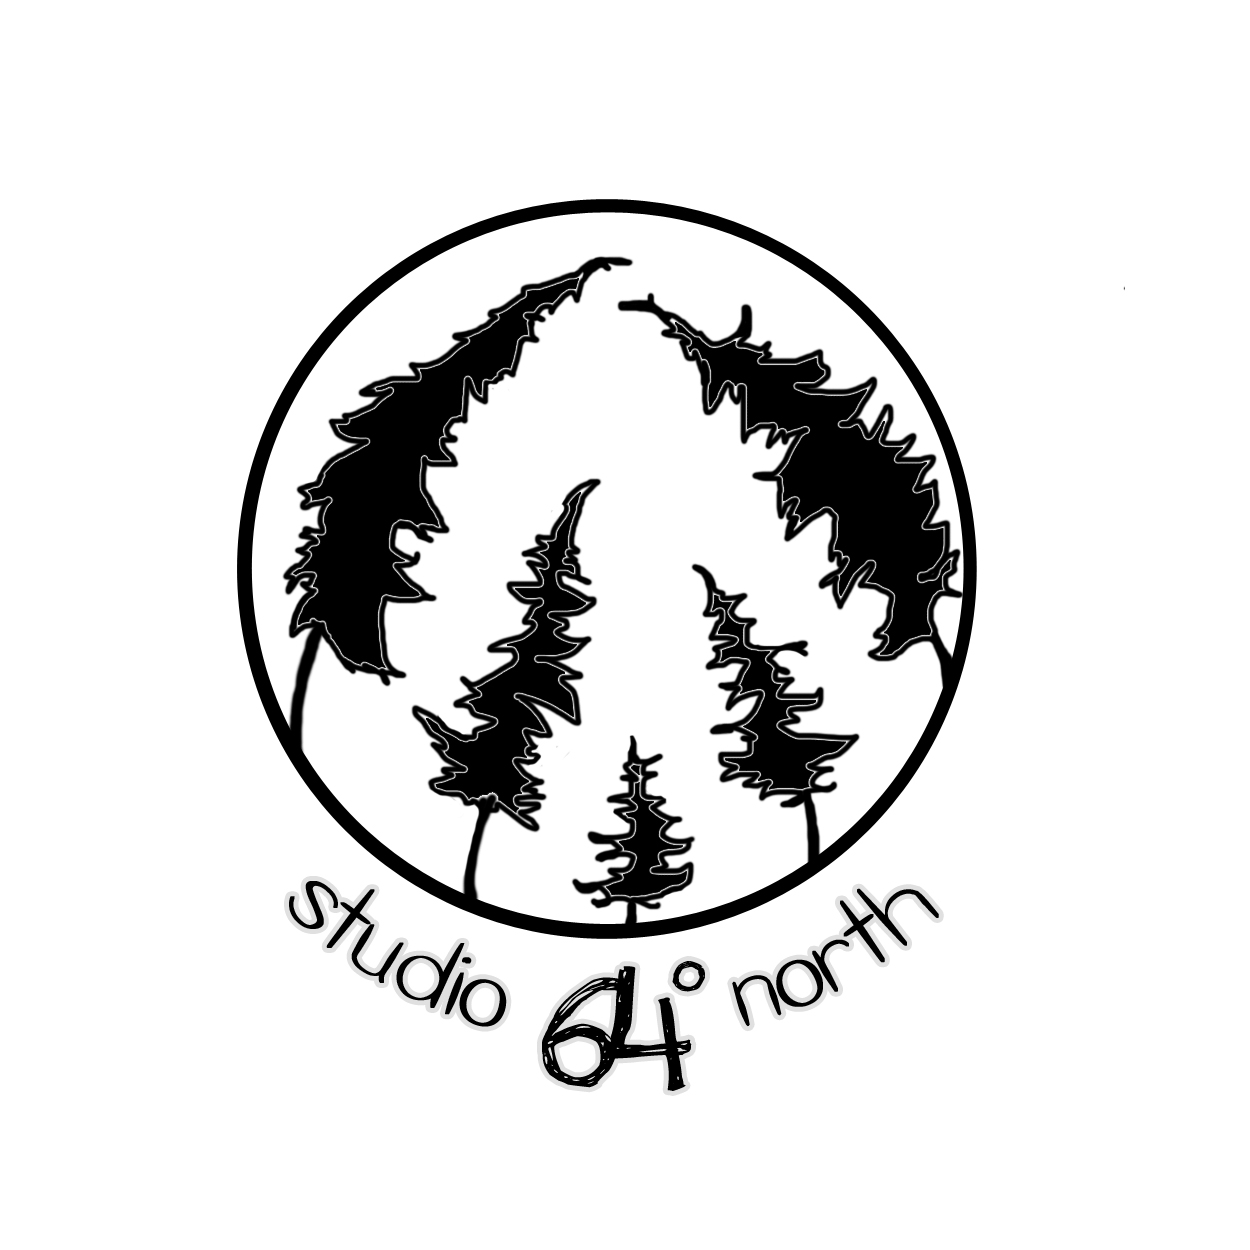 Studio 64 North version 3.jpg